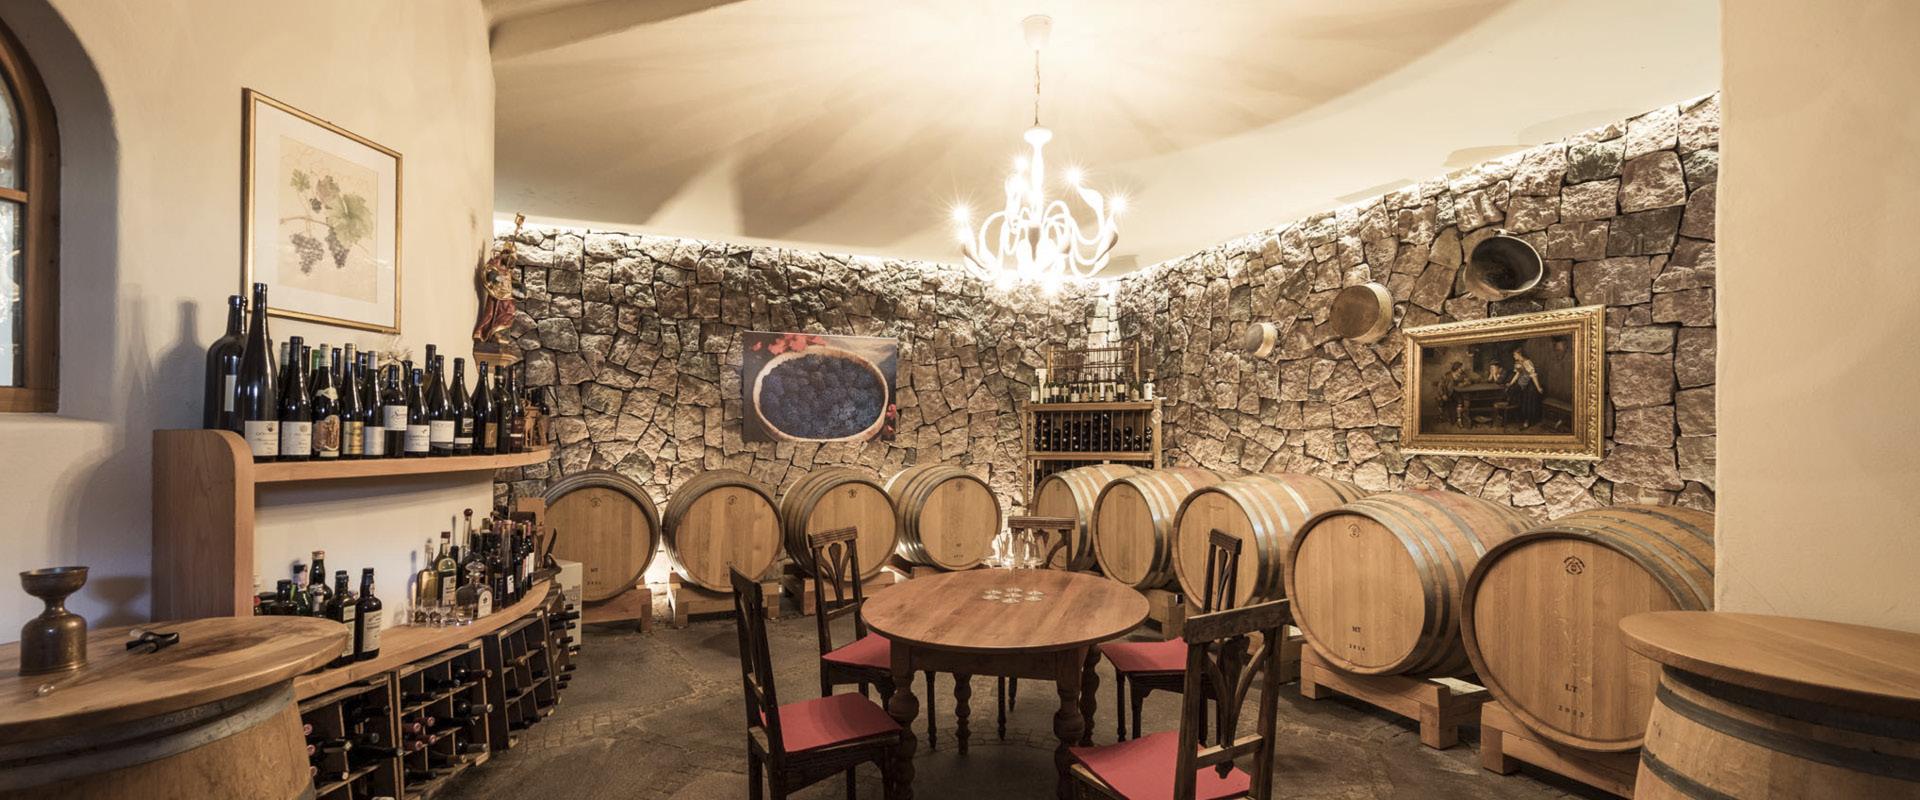 Rotwein Holzfaesser Weingut Dona